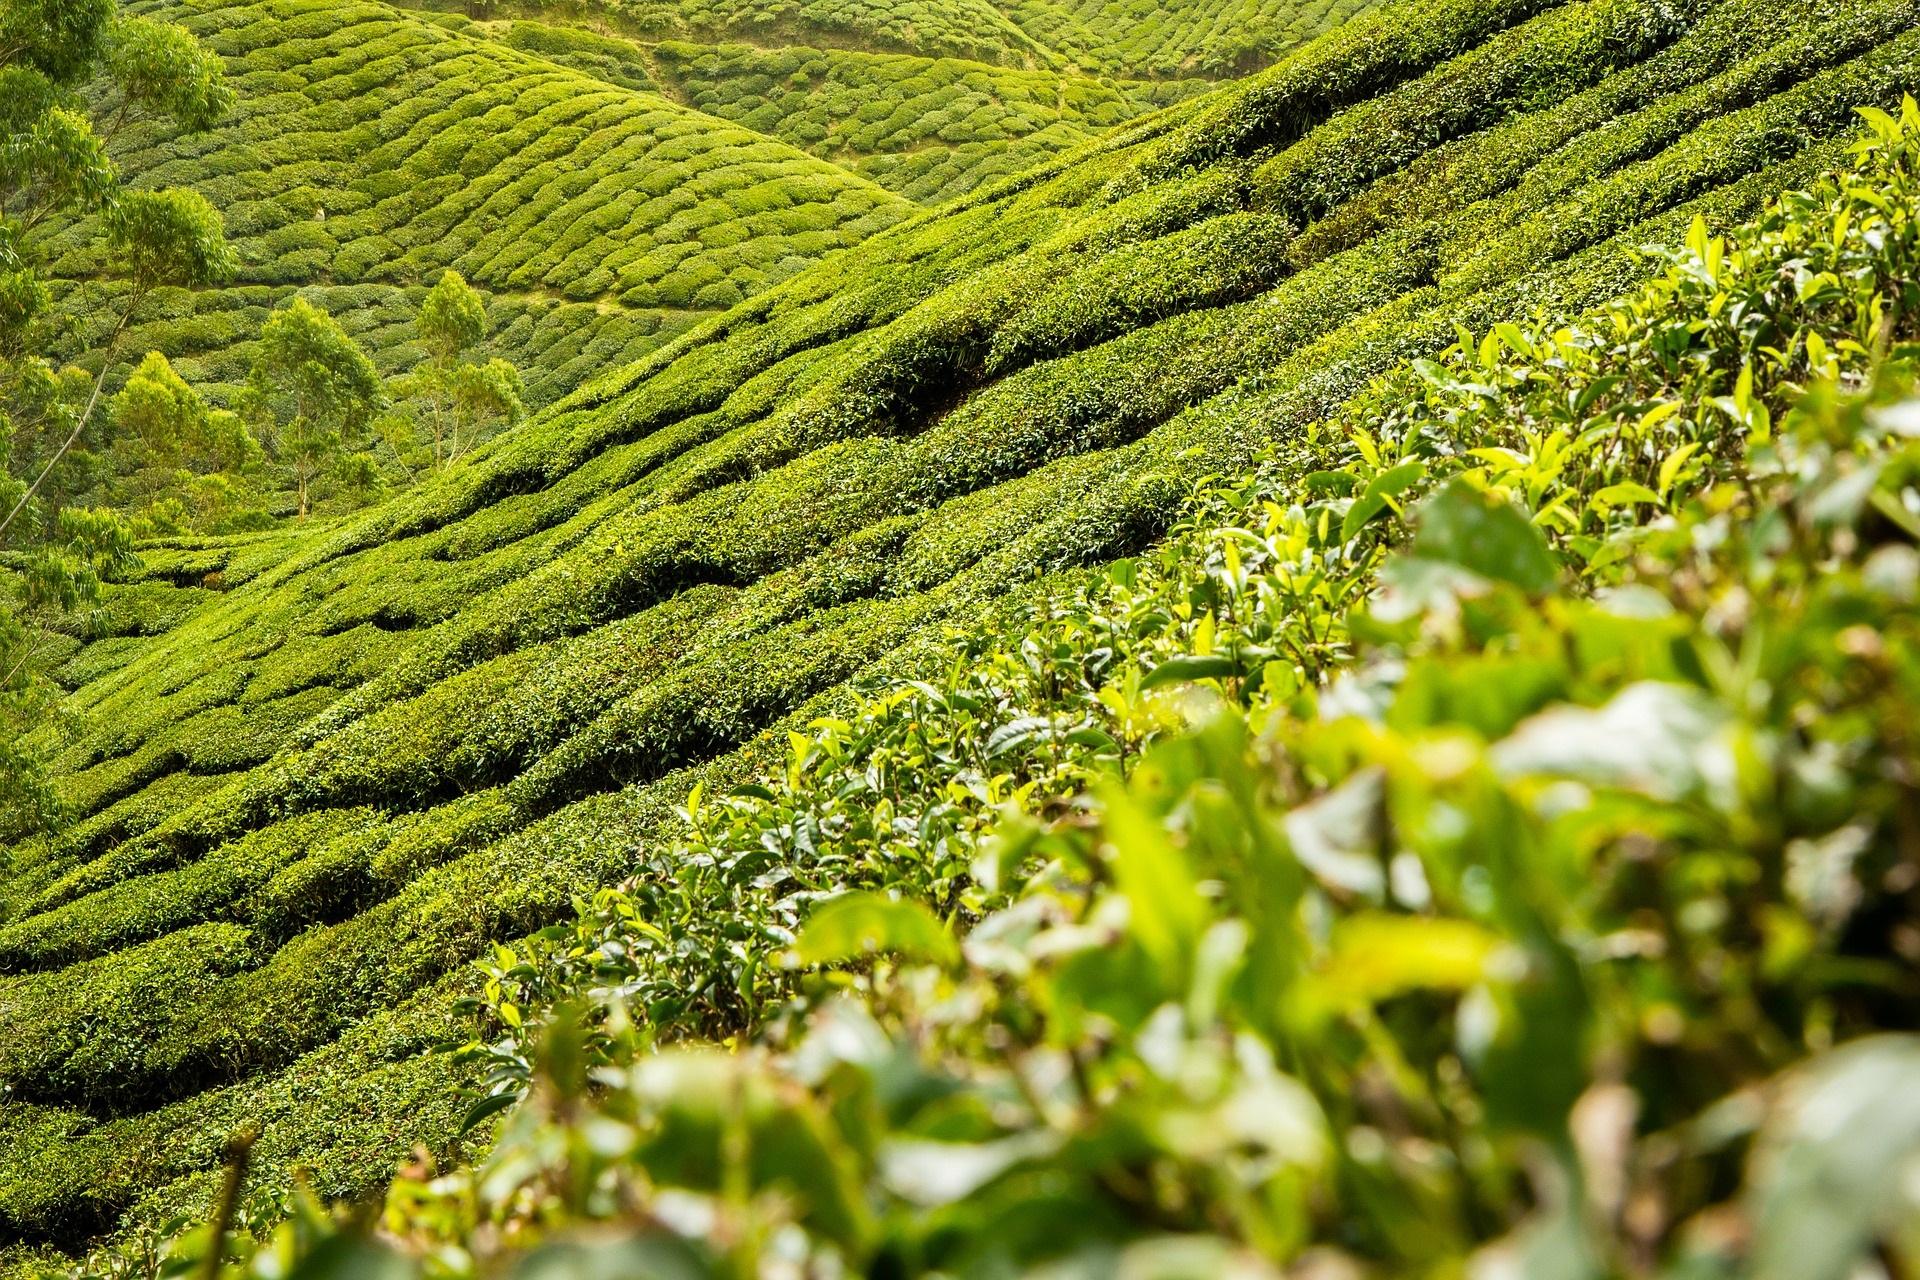 Southeast Asia Landscape Coffee Plants